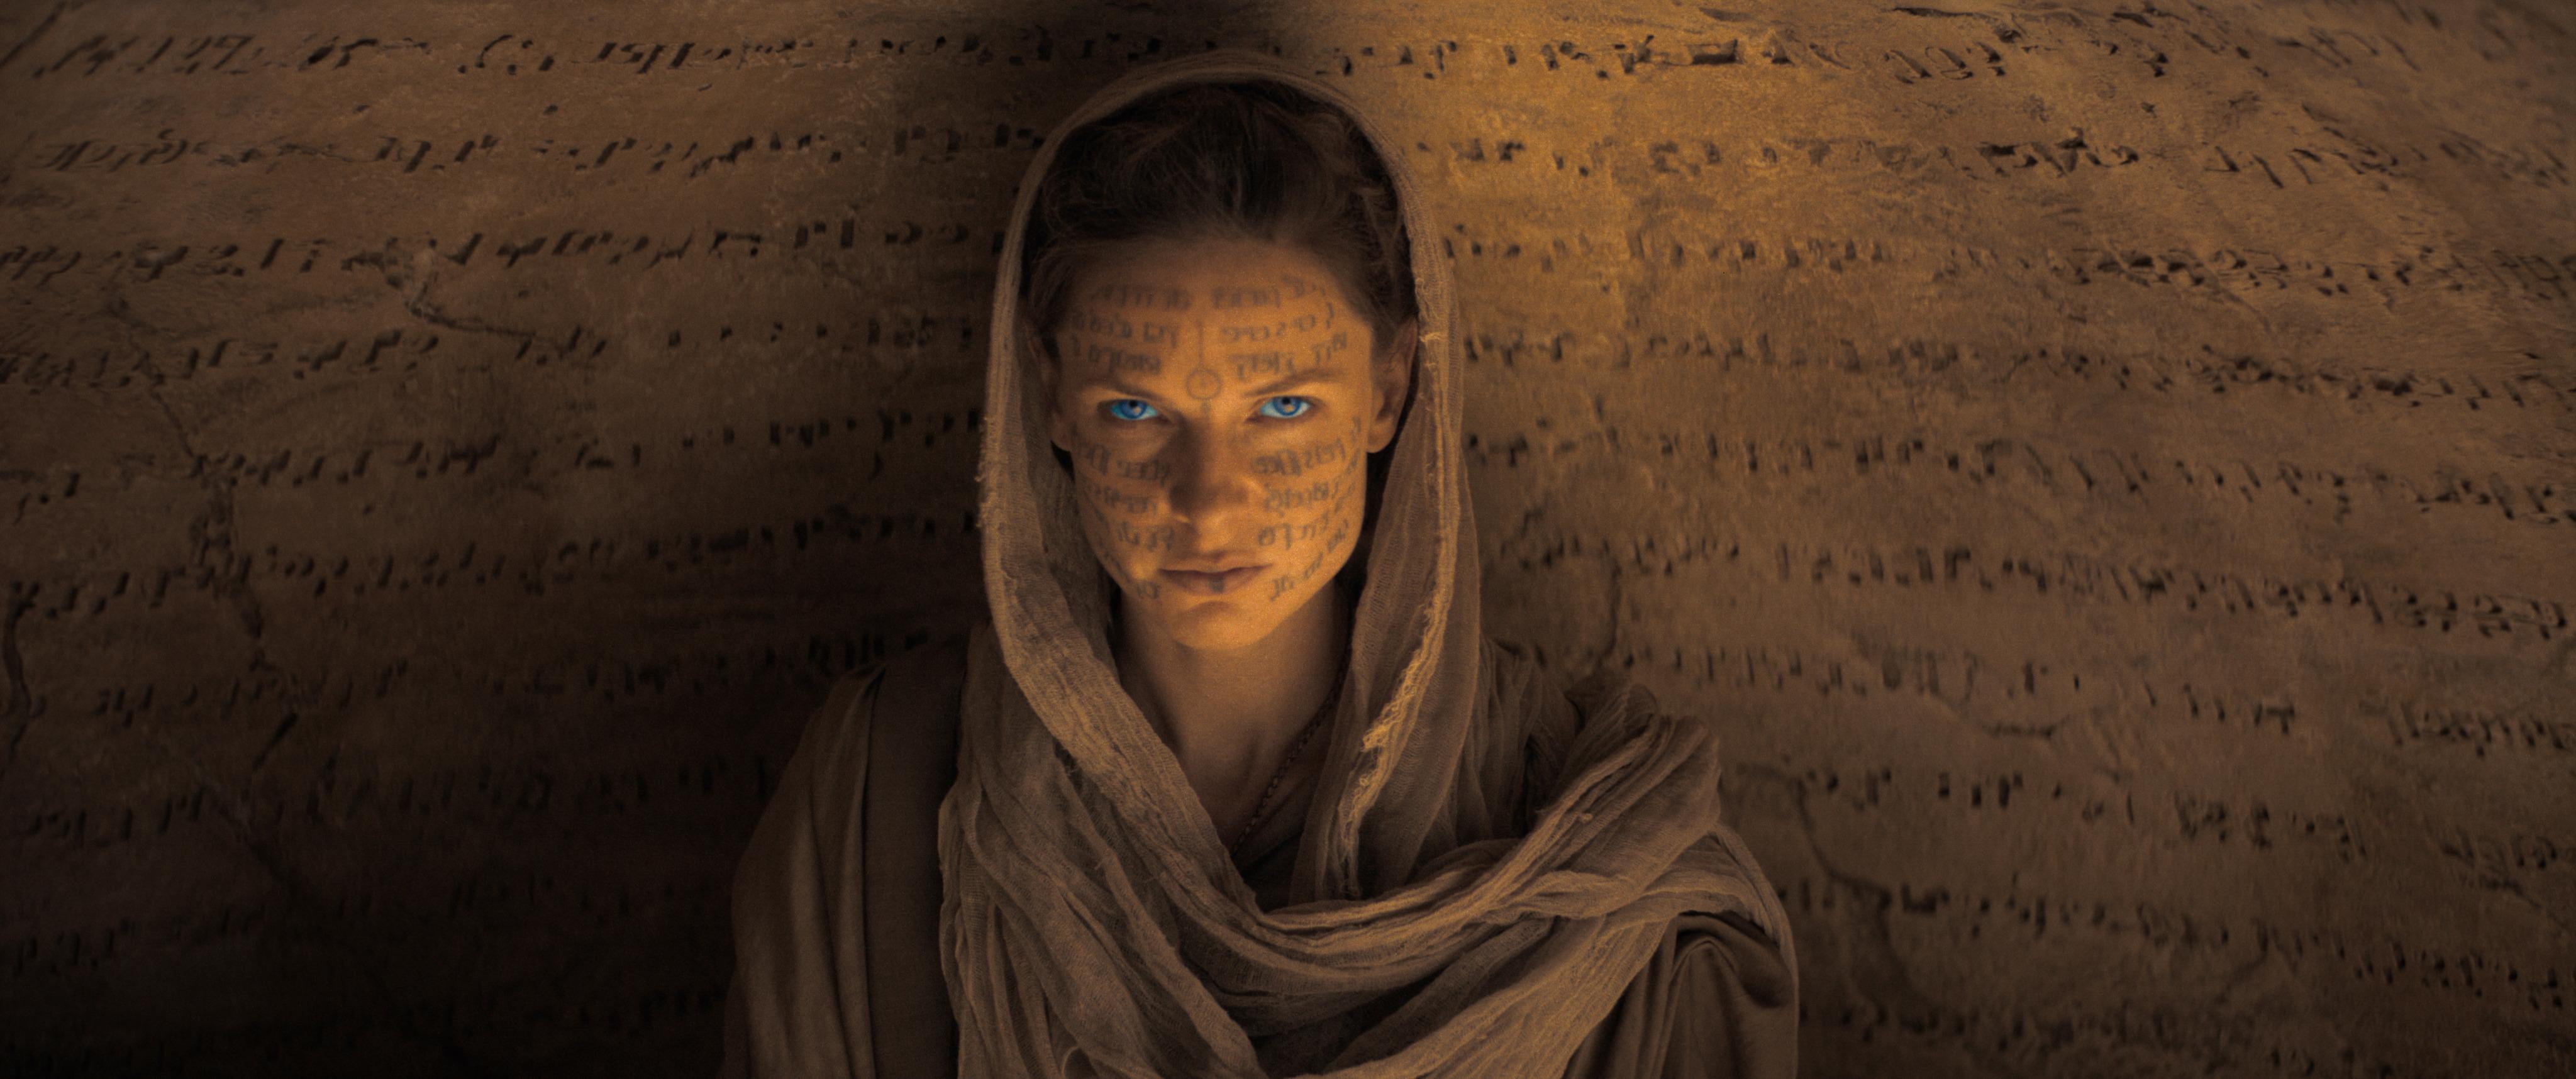 Rebecca Ferguson as Lady Jessica, member of the Bene Gesserit.